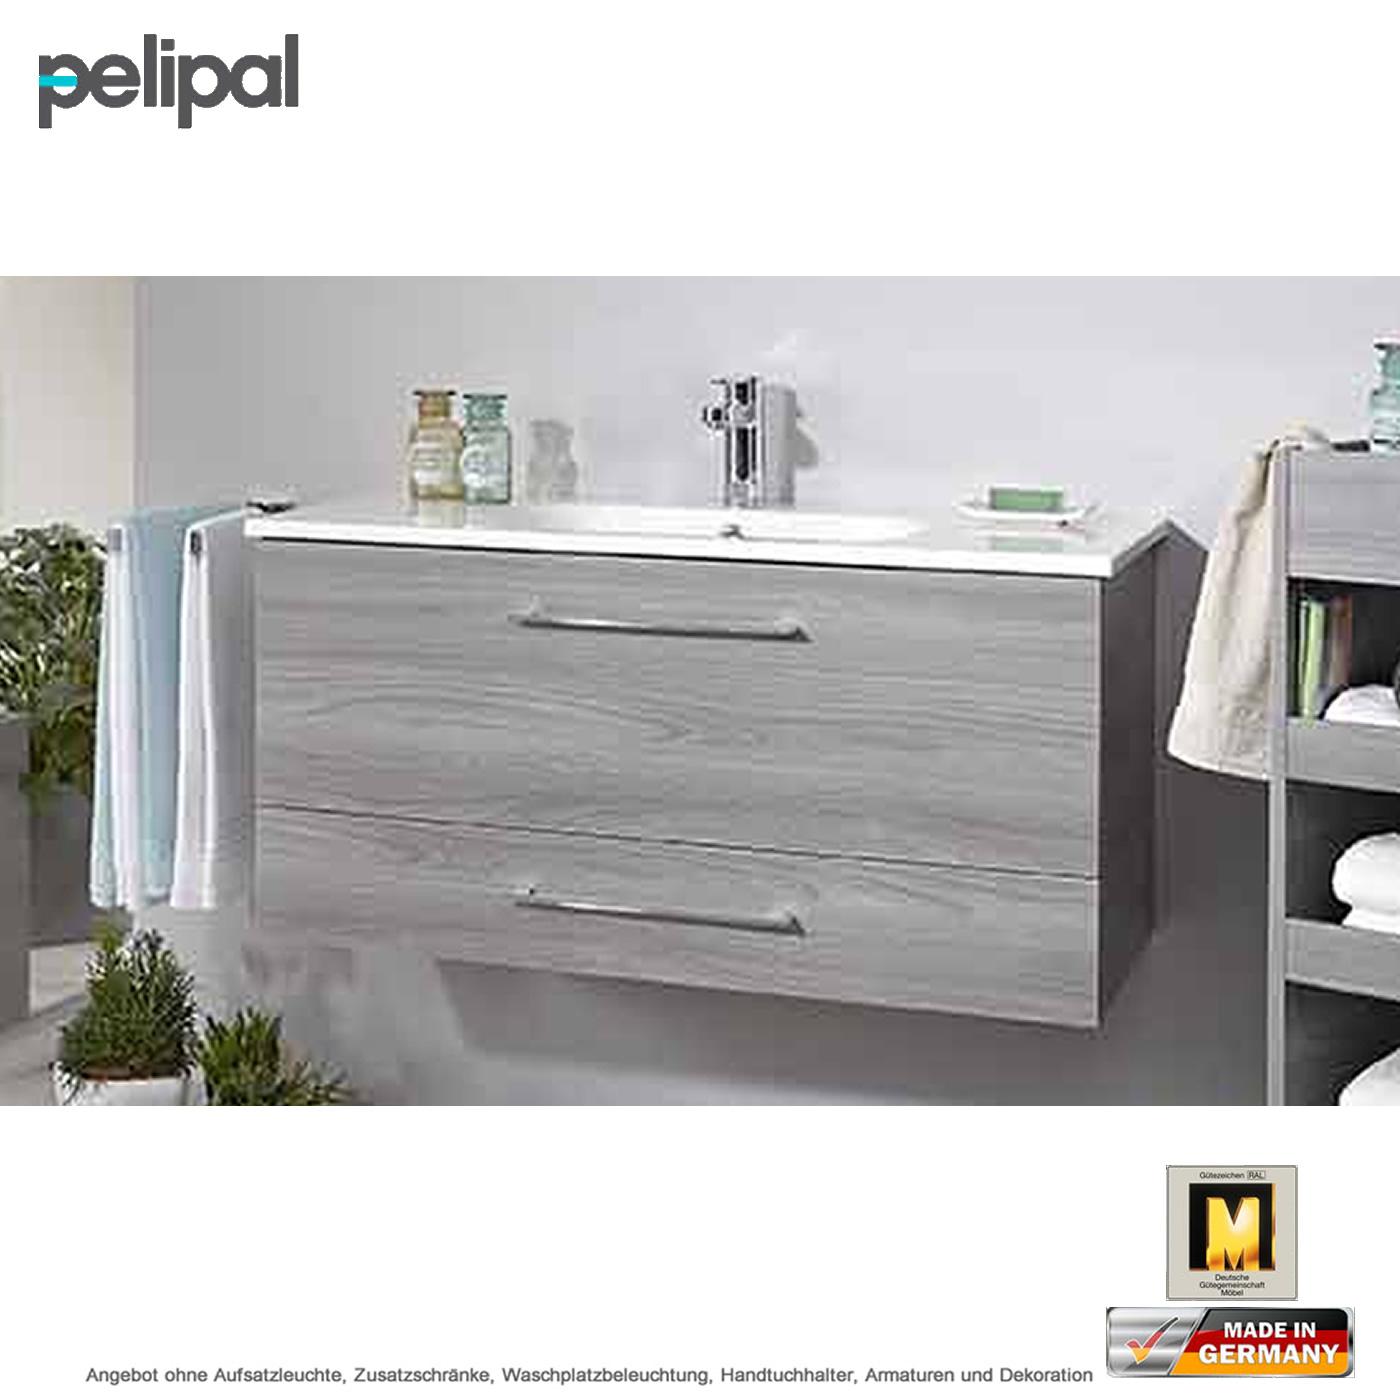 pelipal solitaire 6110 waschtisch set 100 cm 2 ausz ge. Black Bedroom Furniture Sets. Home Design Ideas